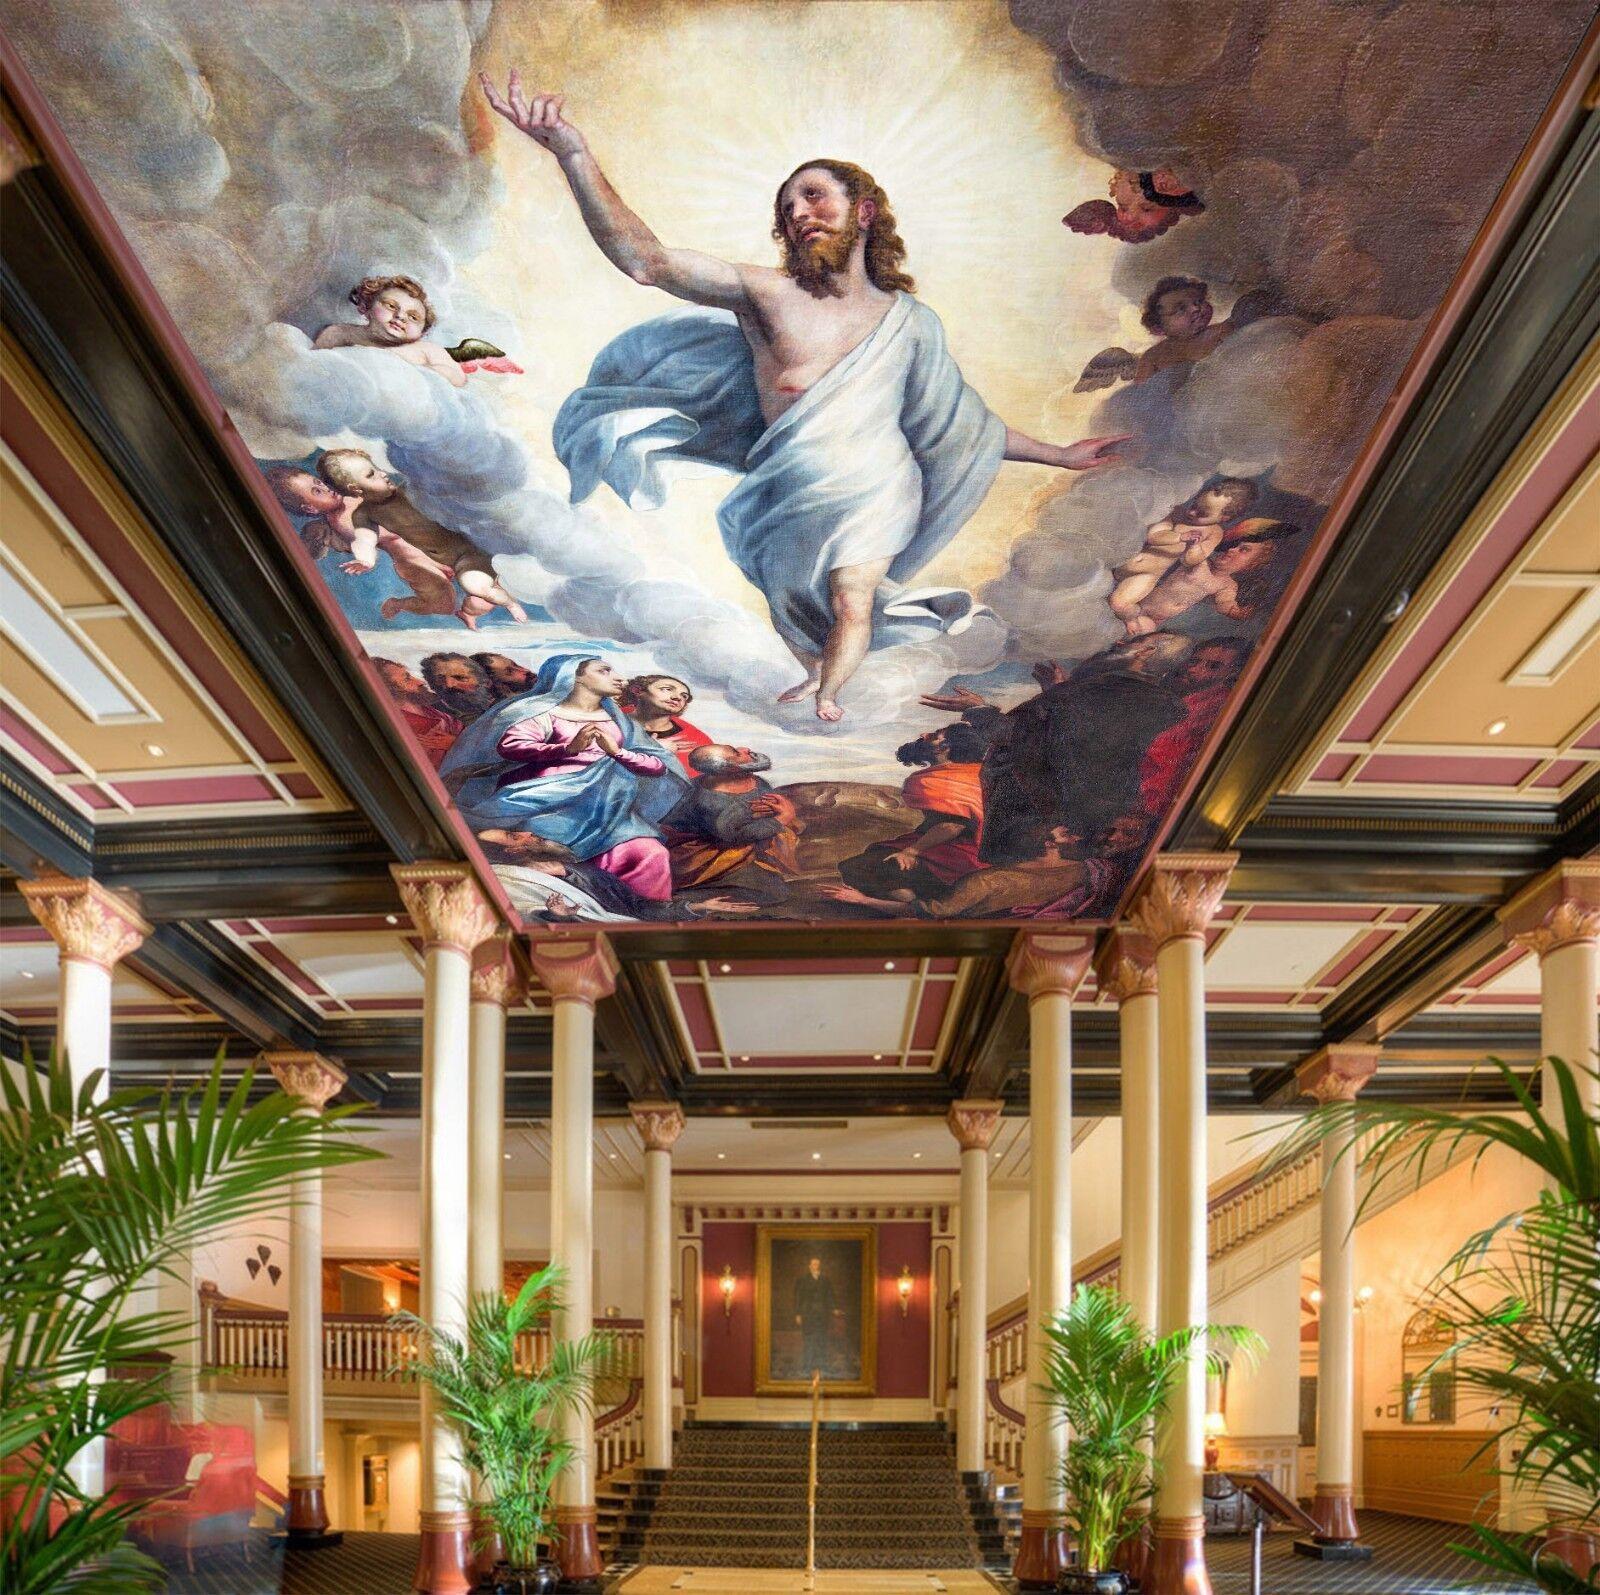 3D God And People World 886 Wallpaper Mural Wall Print Wall Wallpaper Murals US